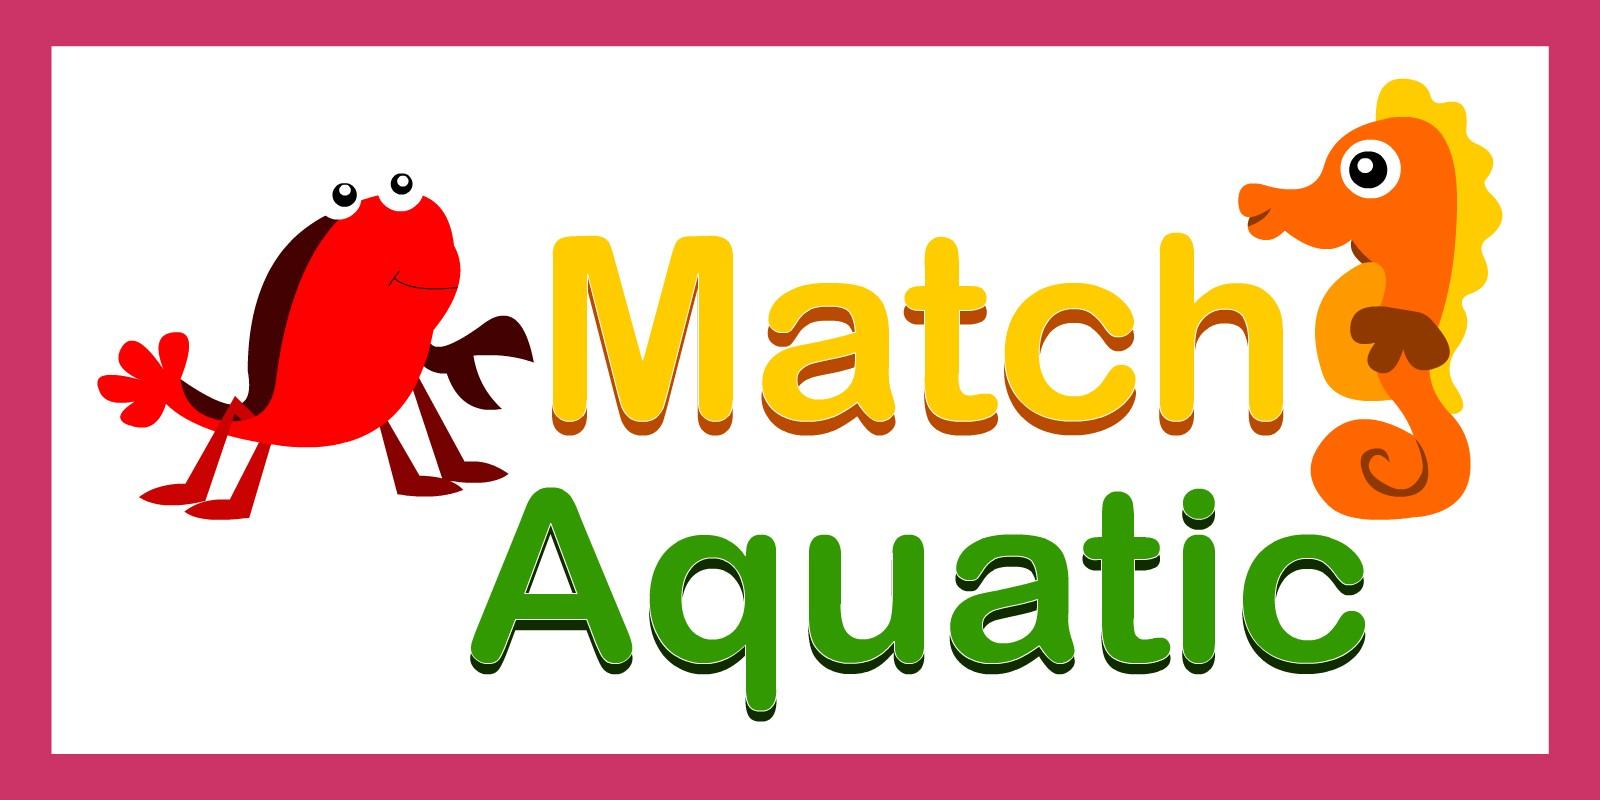 Match Aqautic - Unity Kids Game